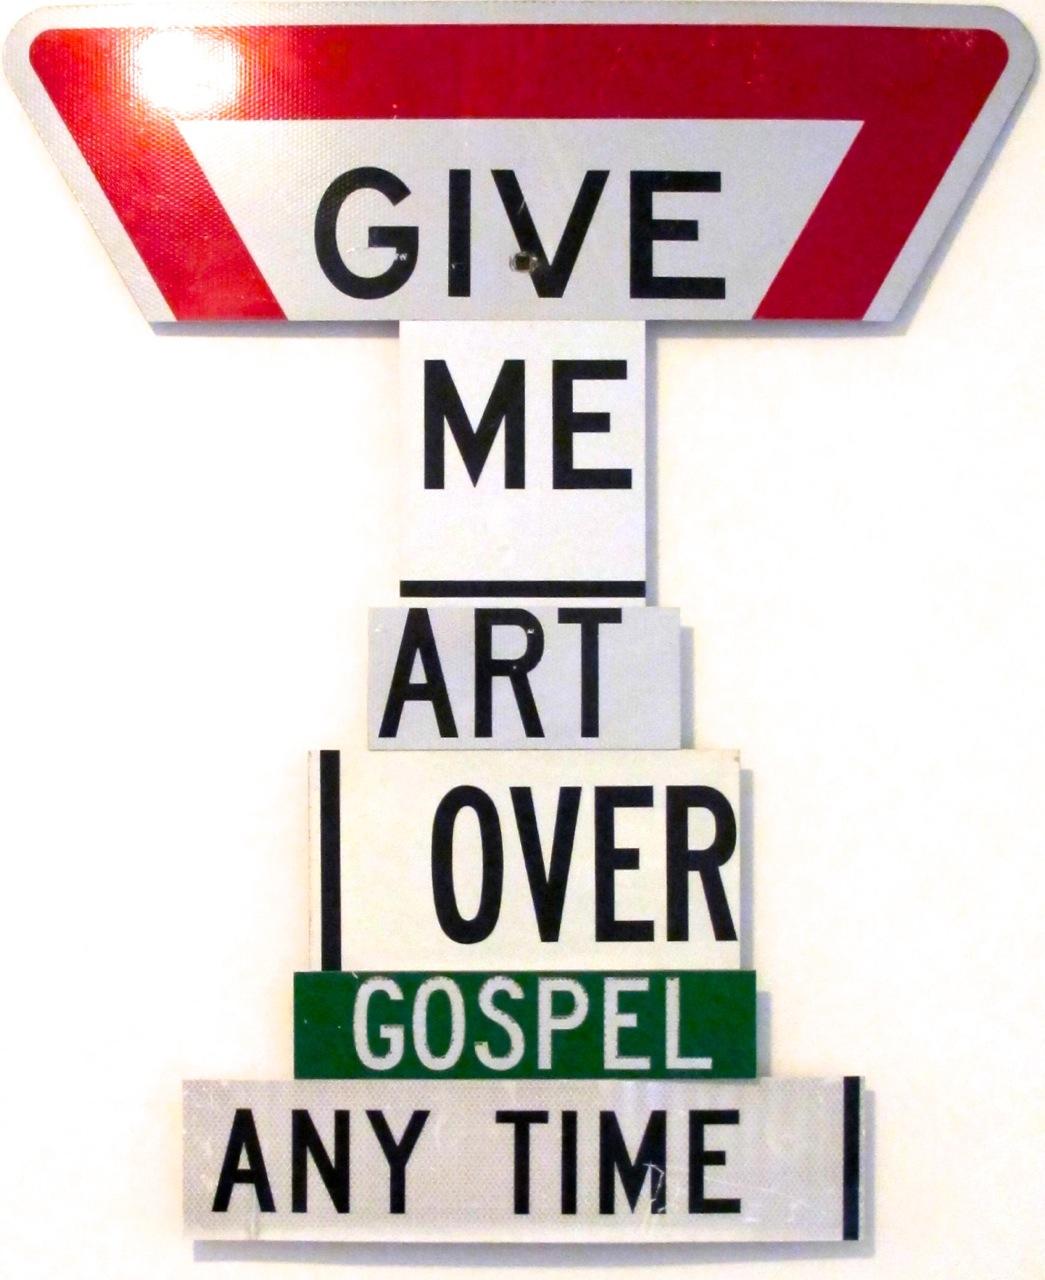 GIVE ME ART OVER GOSPEL ANY TIME - Alan James 2012